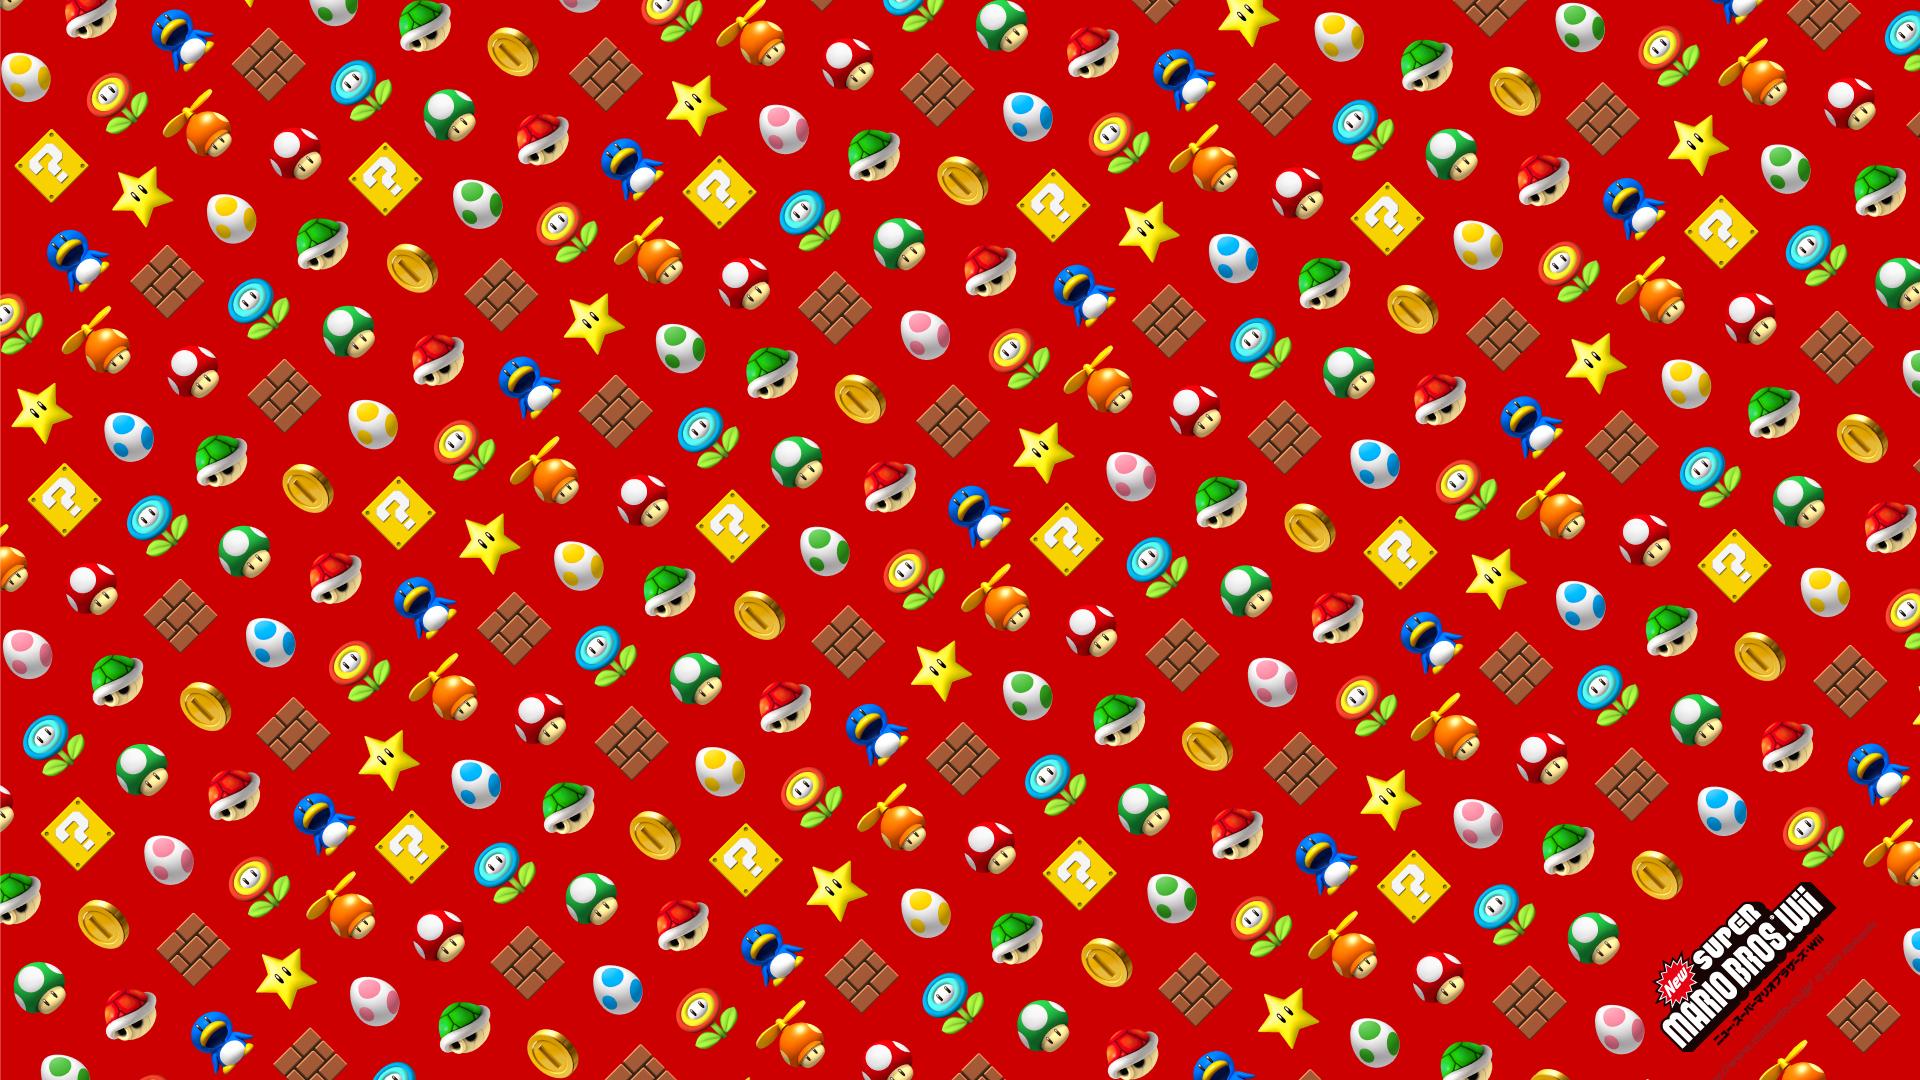 Free Download Mario Images New Super Mario Bros Wii Items